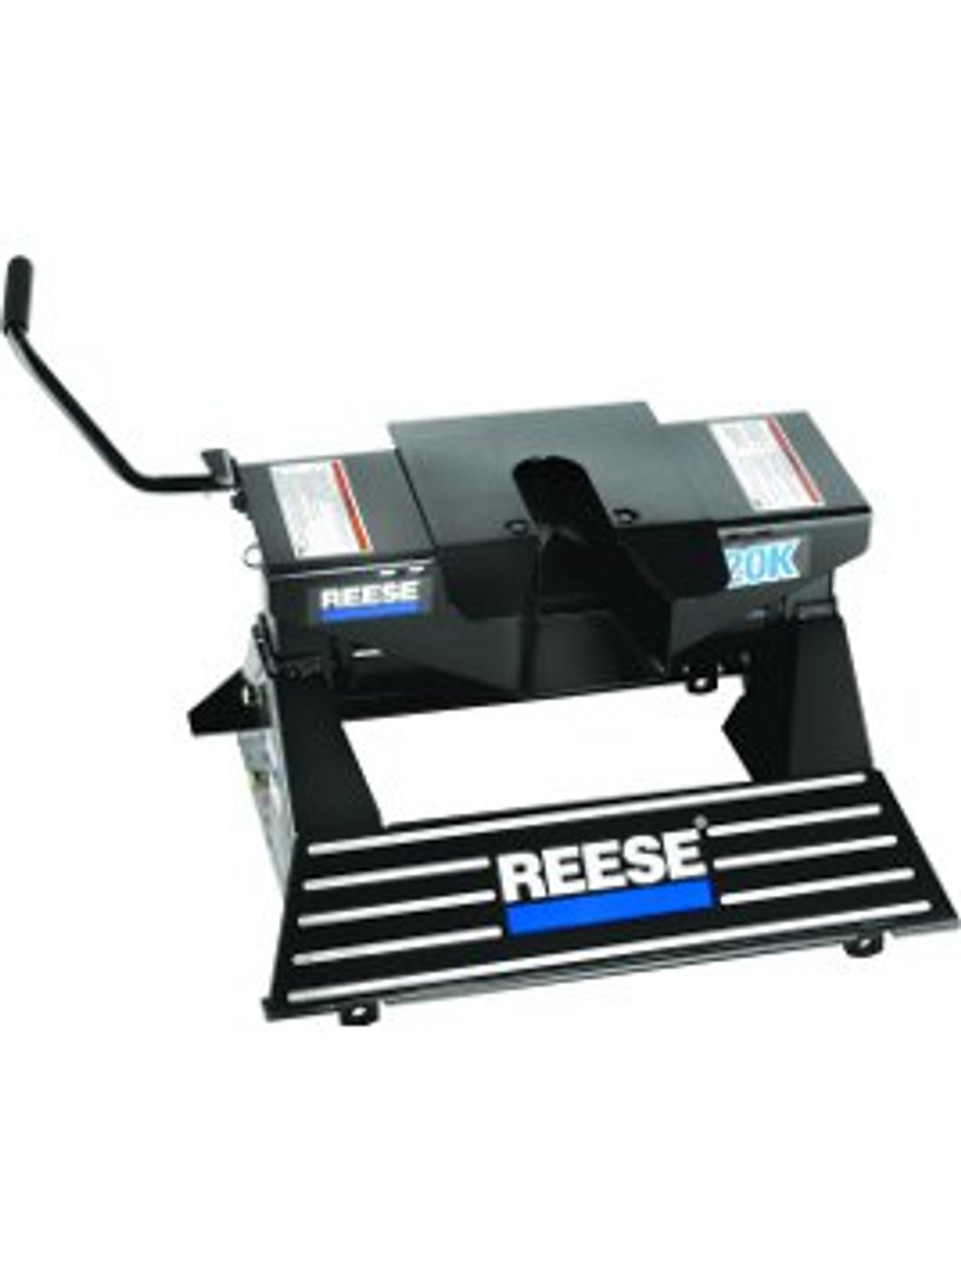 30033 --- Reese 22K Fifth Wheel Hitch